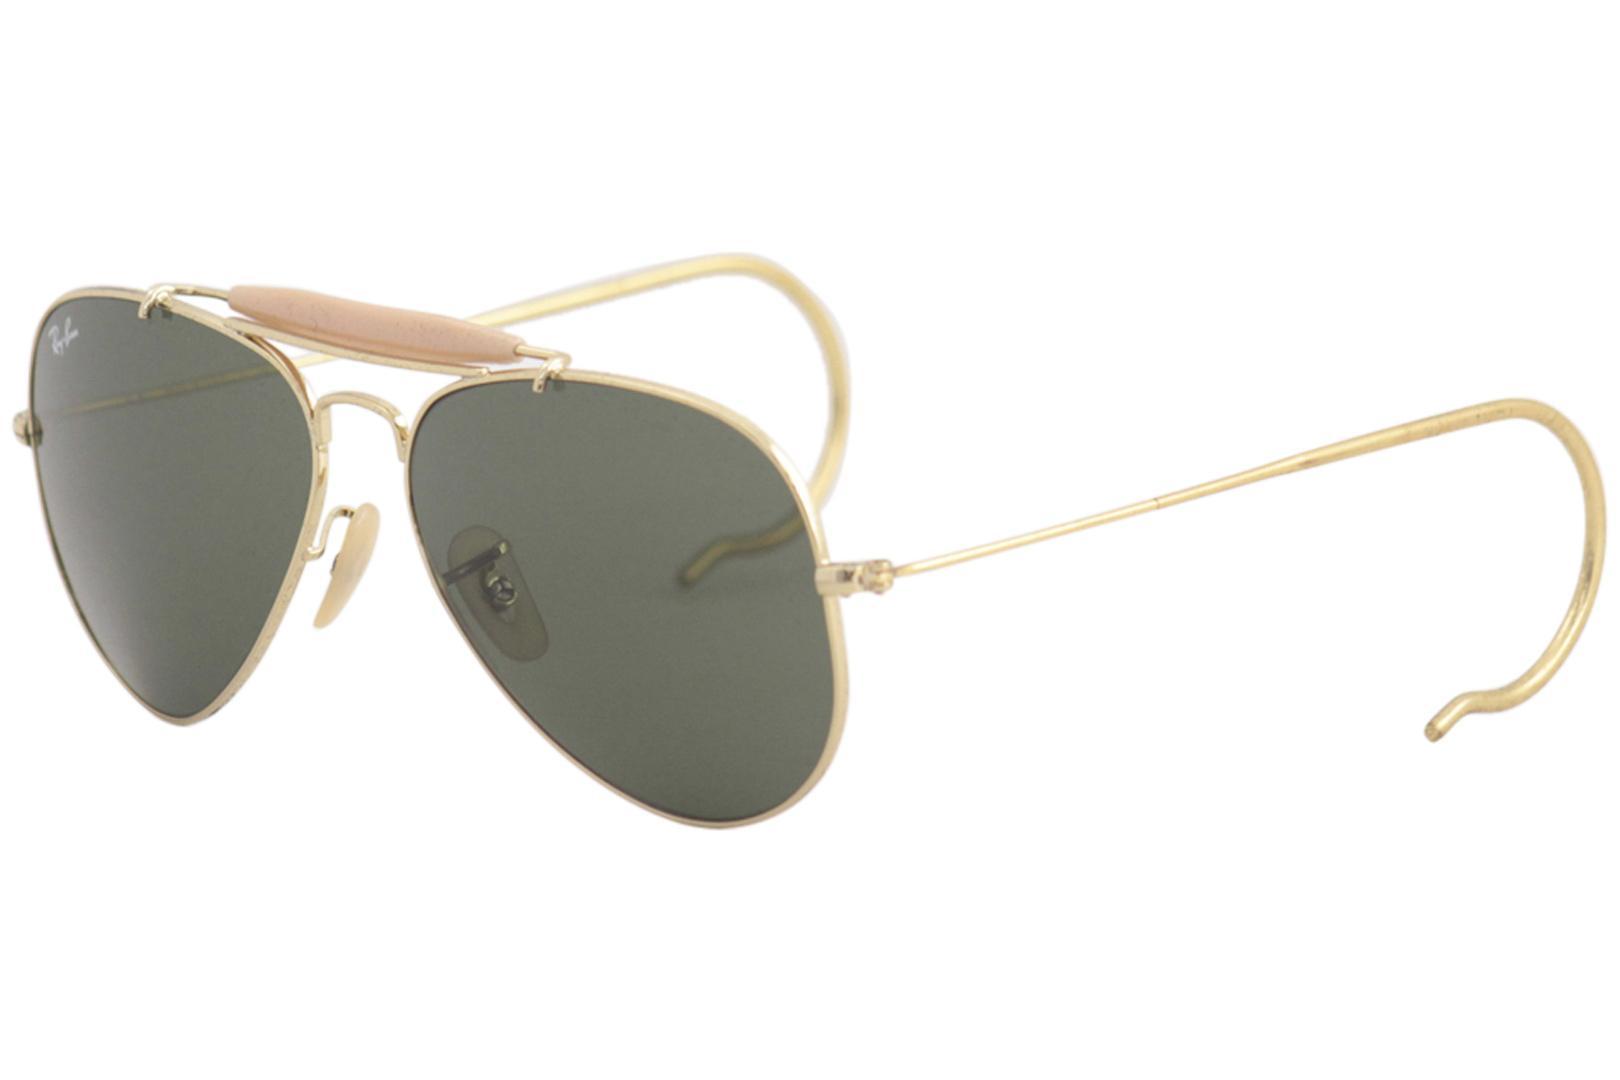 4841a3e39a RAY-BAN 3030 RayBan RB3030 Arista Gold L0216 Outdoorsman Sunglasses